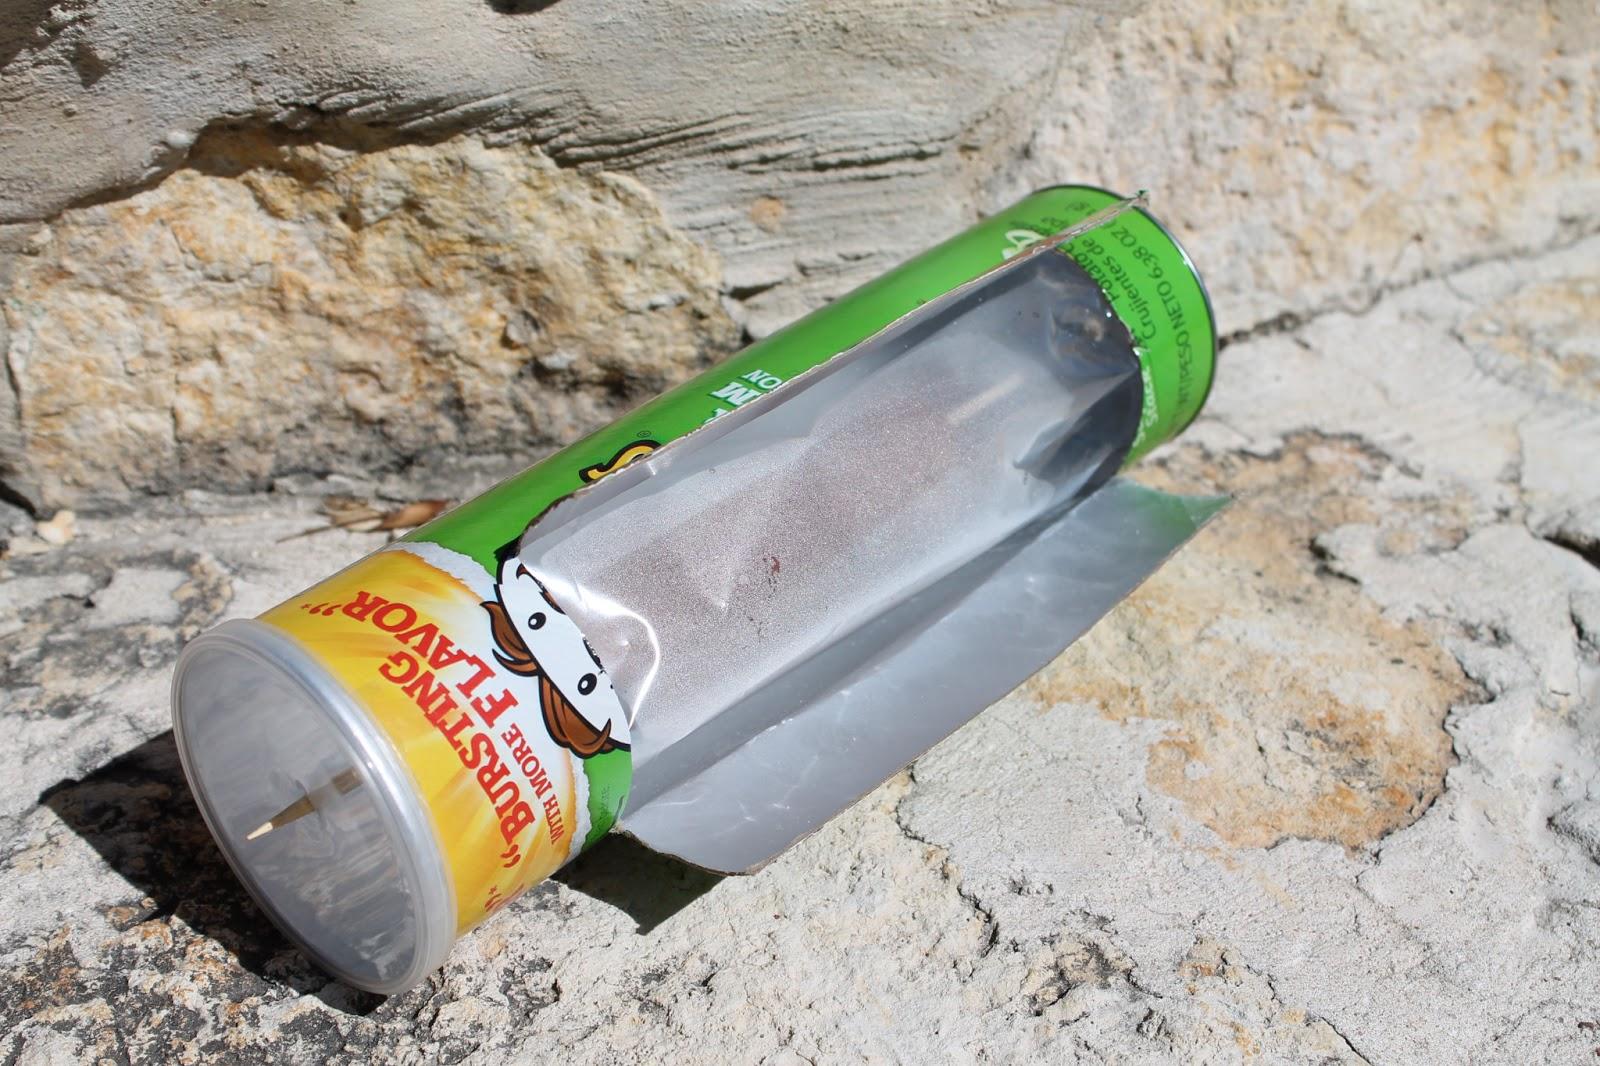 Solar Hot Dog Cooker Pringles Can